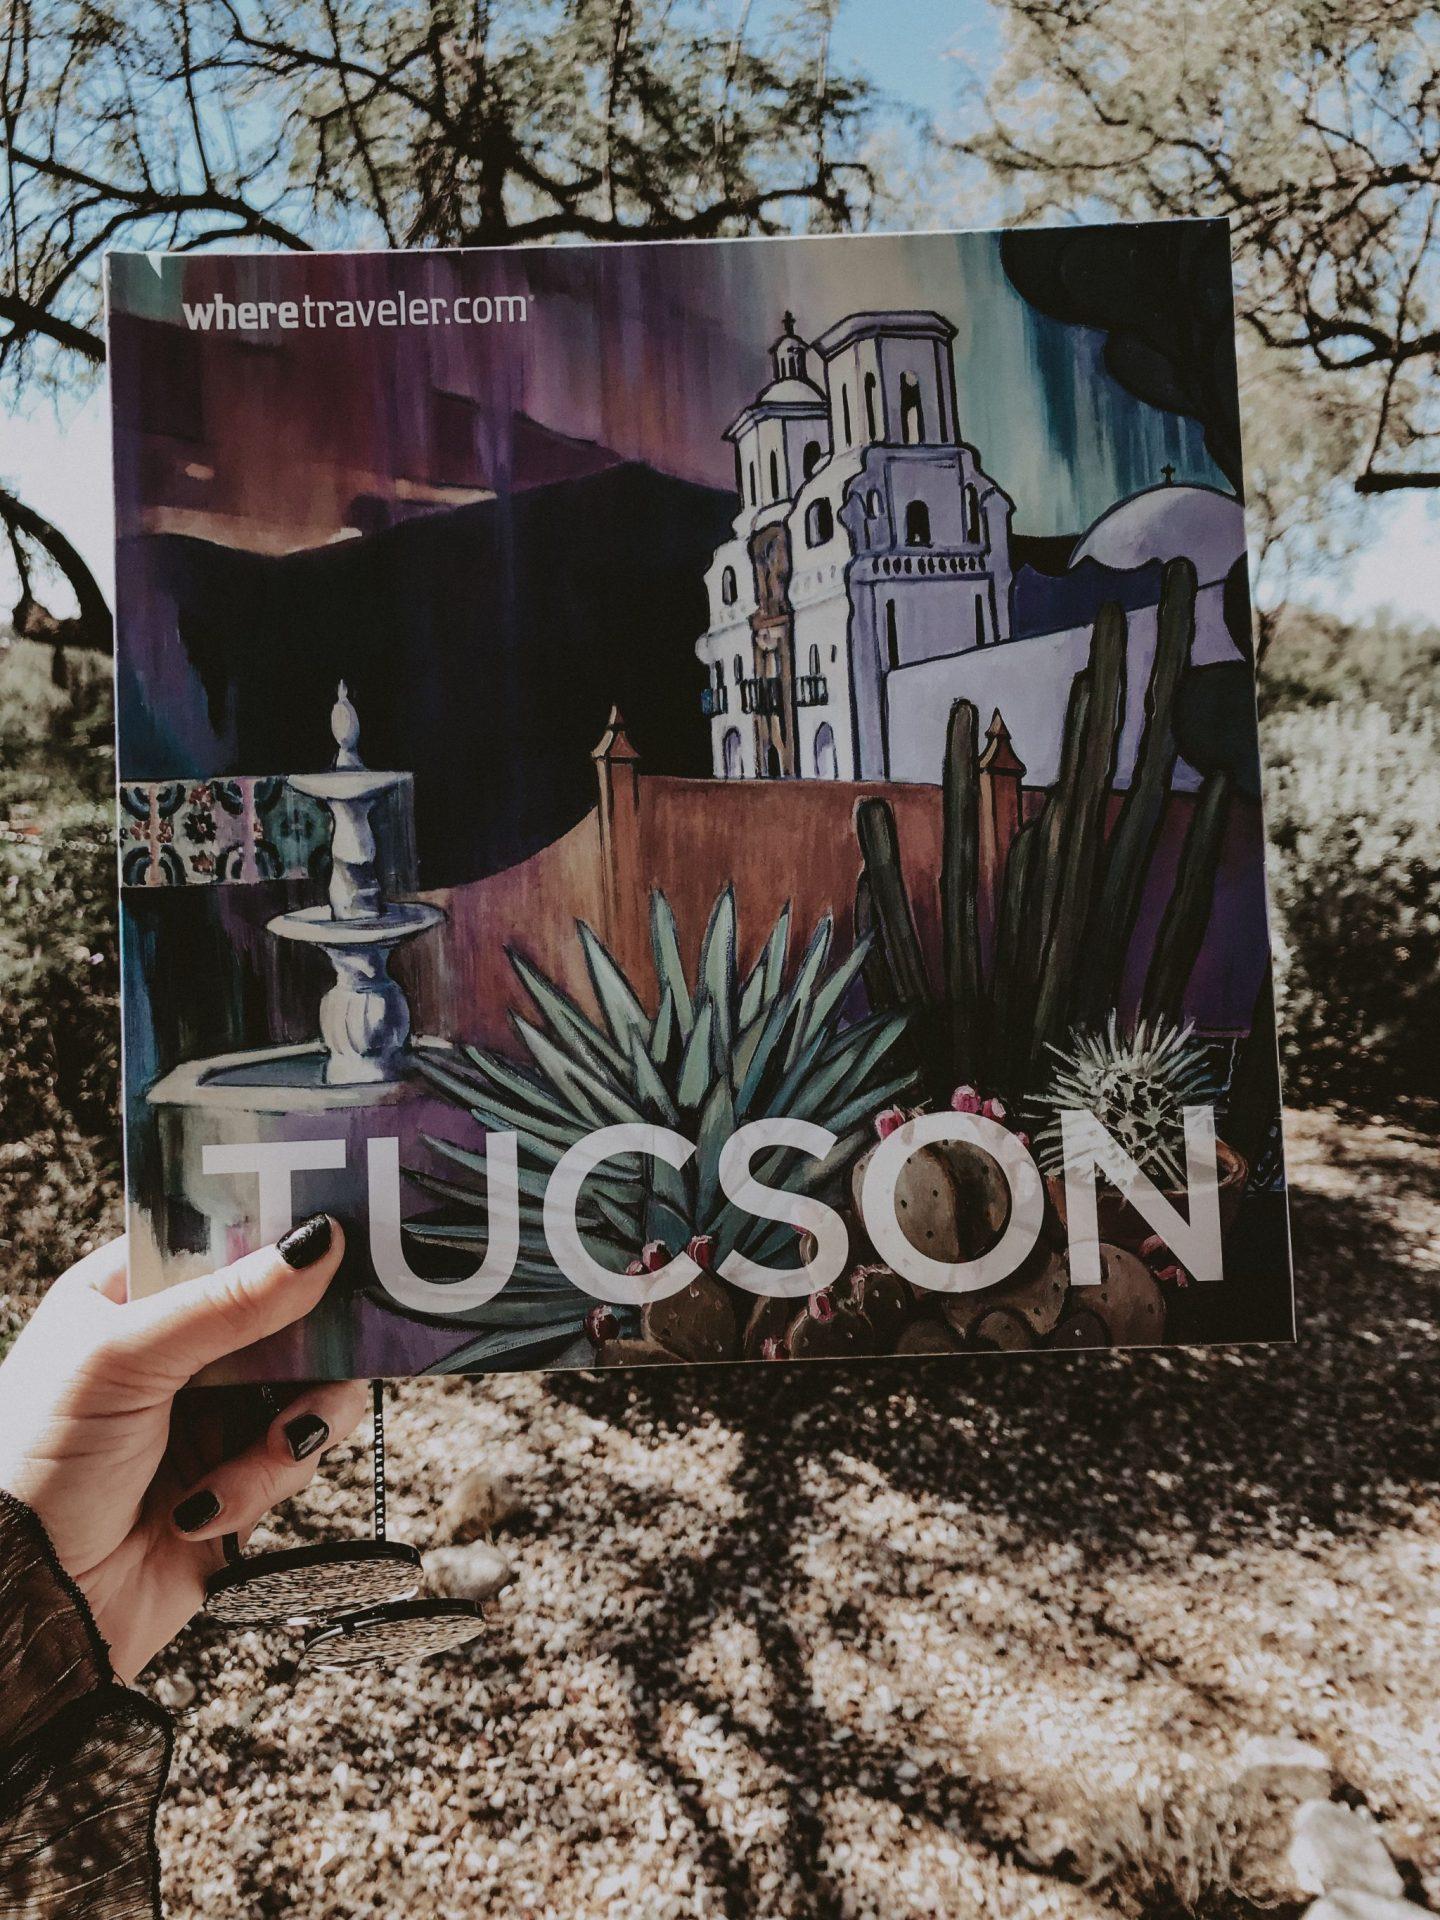 Tucson travel blogpost cathclaire fashion